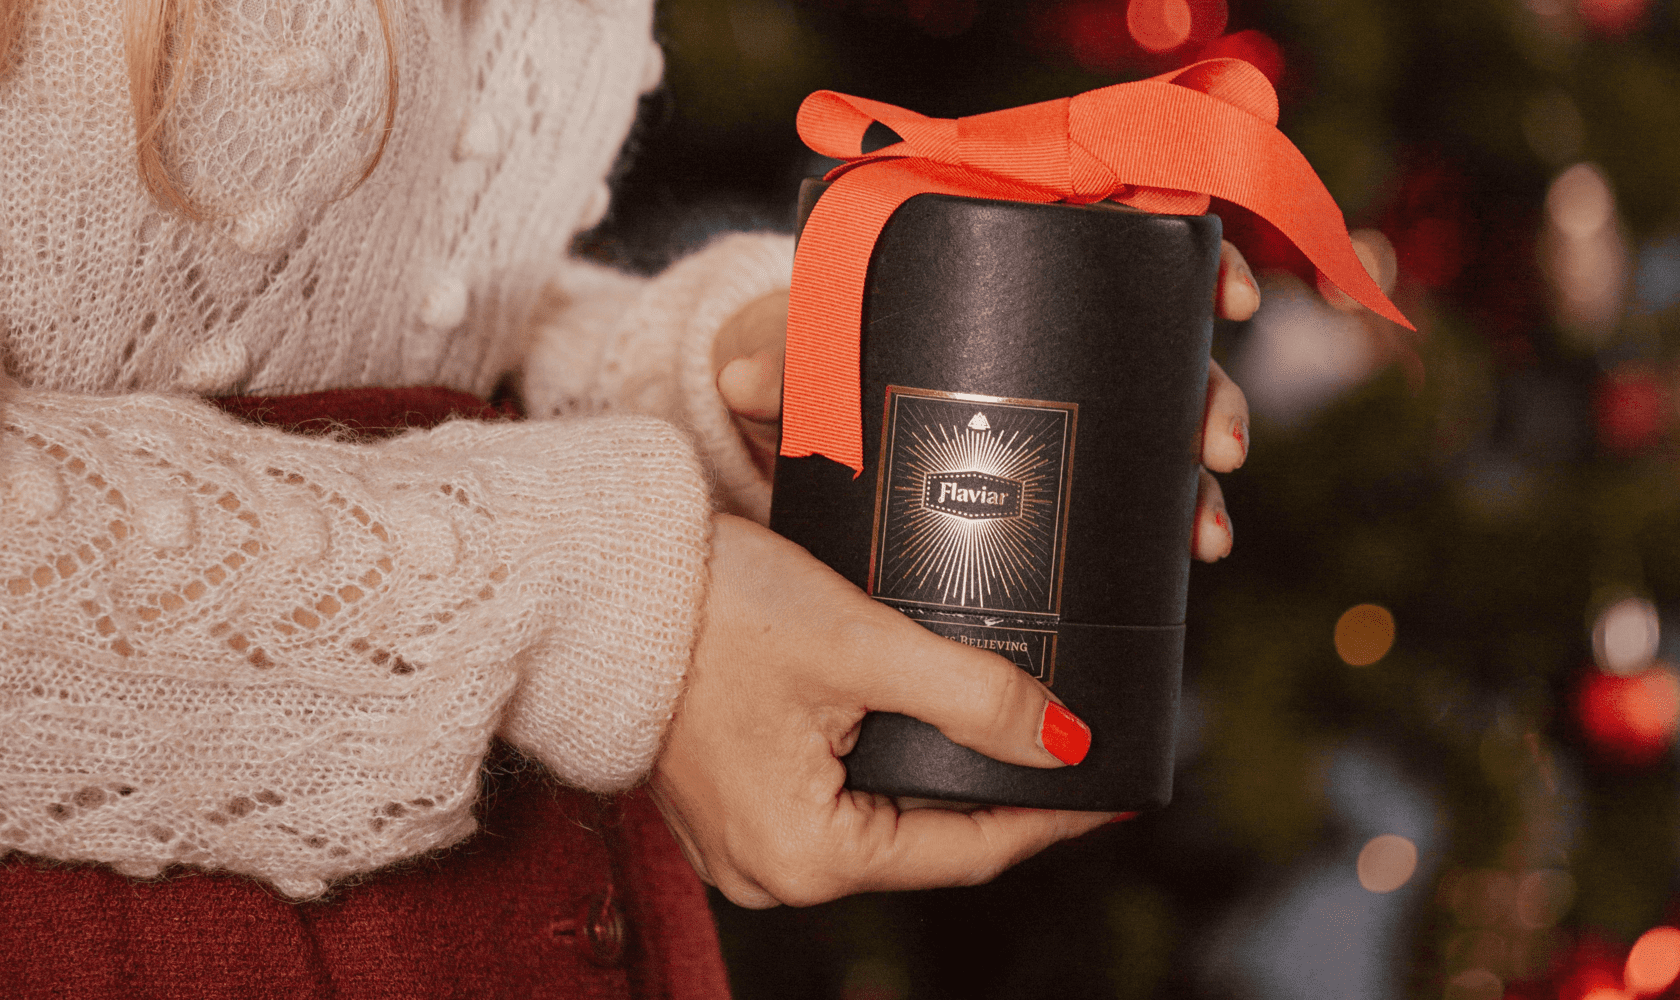 Gift wrapped Flaviar tasting kit